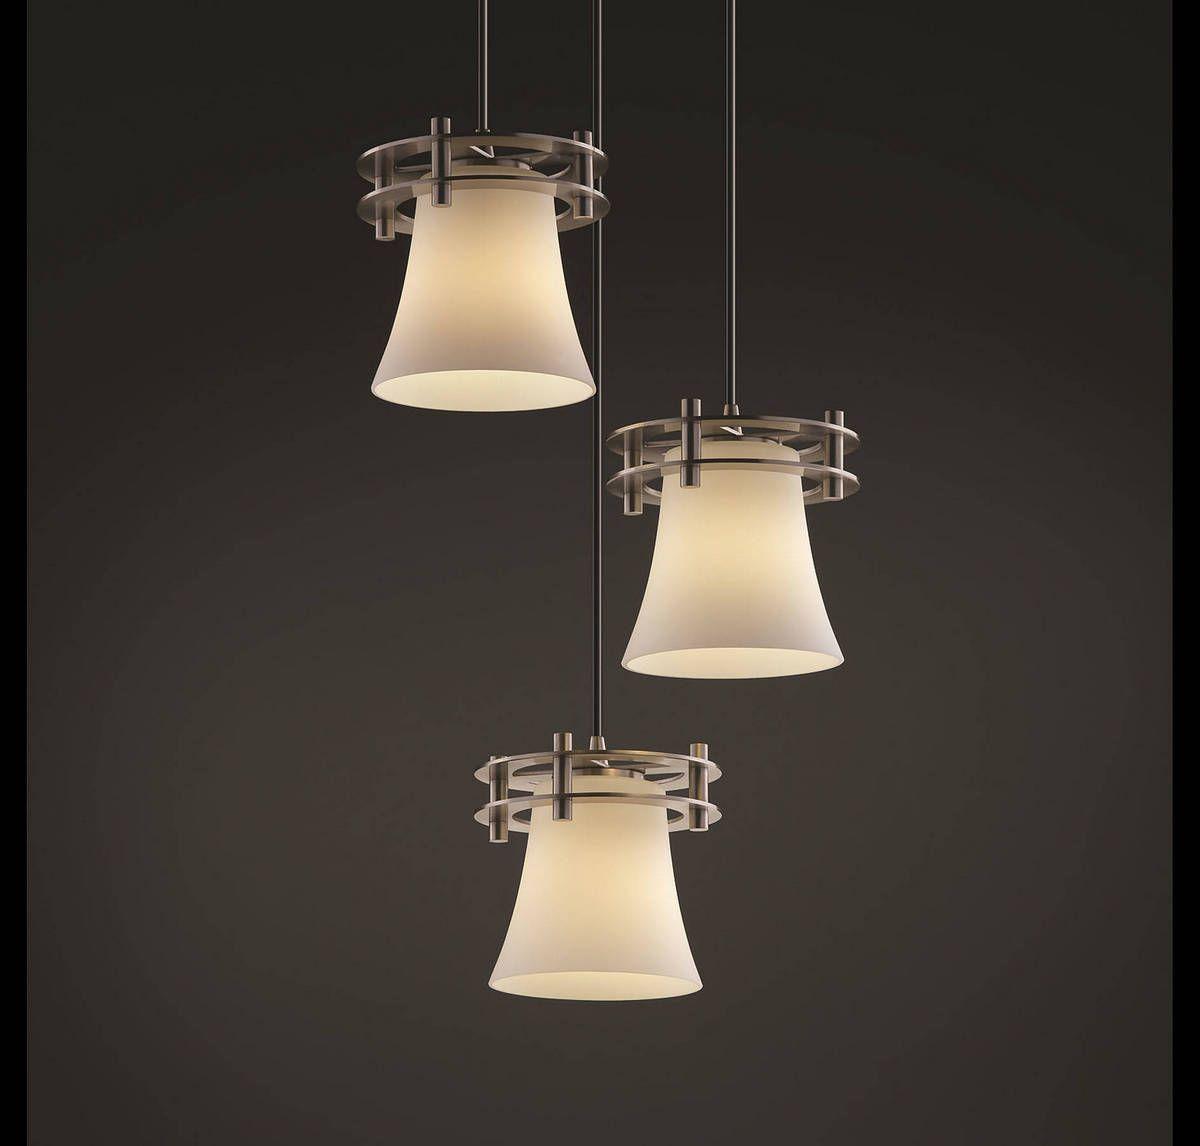 3 light cluster pendant 12 light justice design circa 3light cluster pendant in brushed nickel